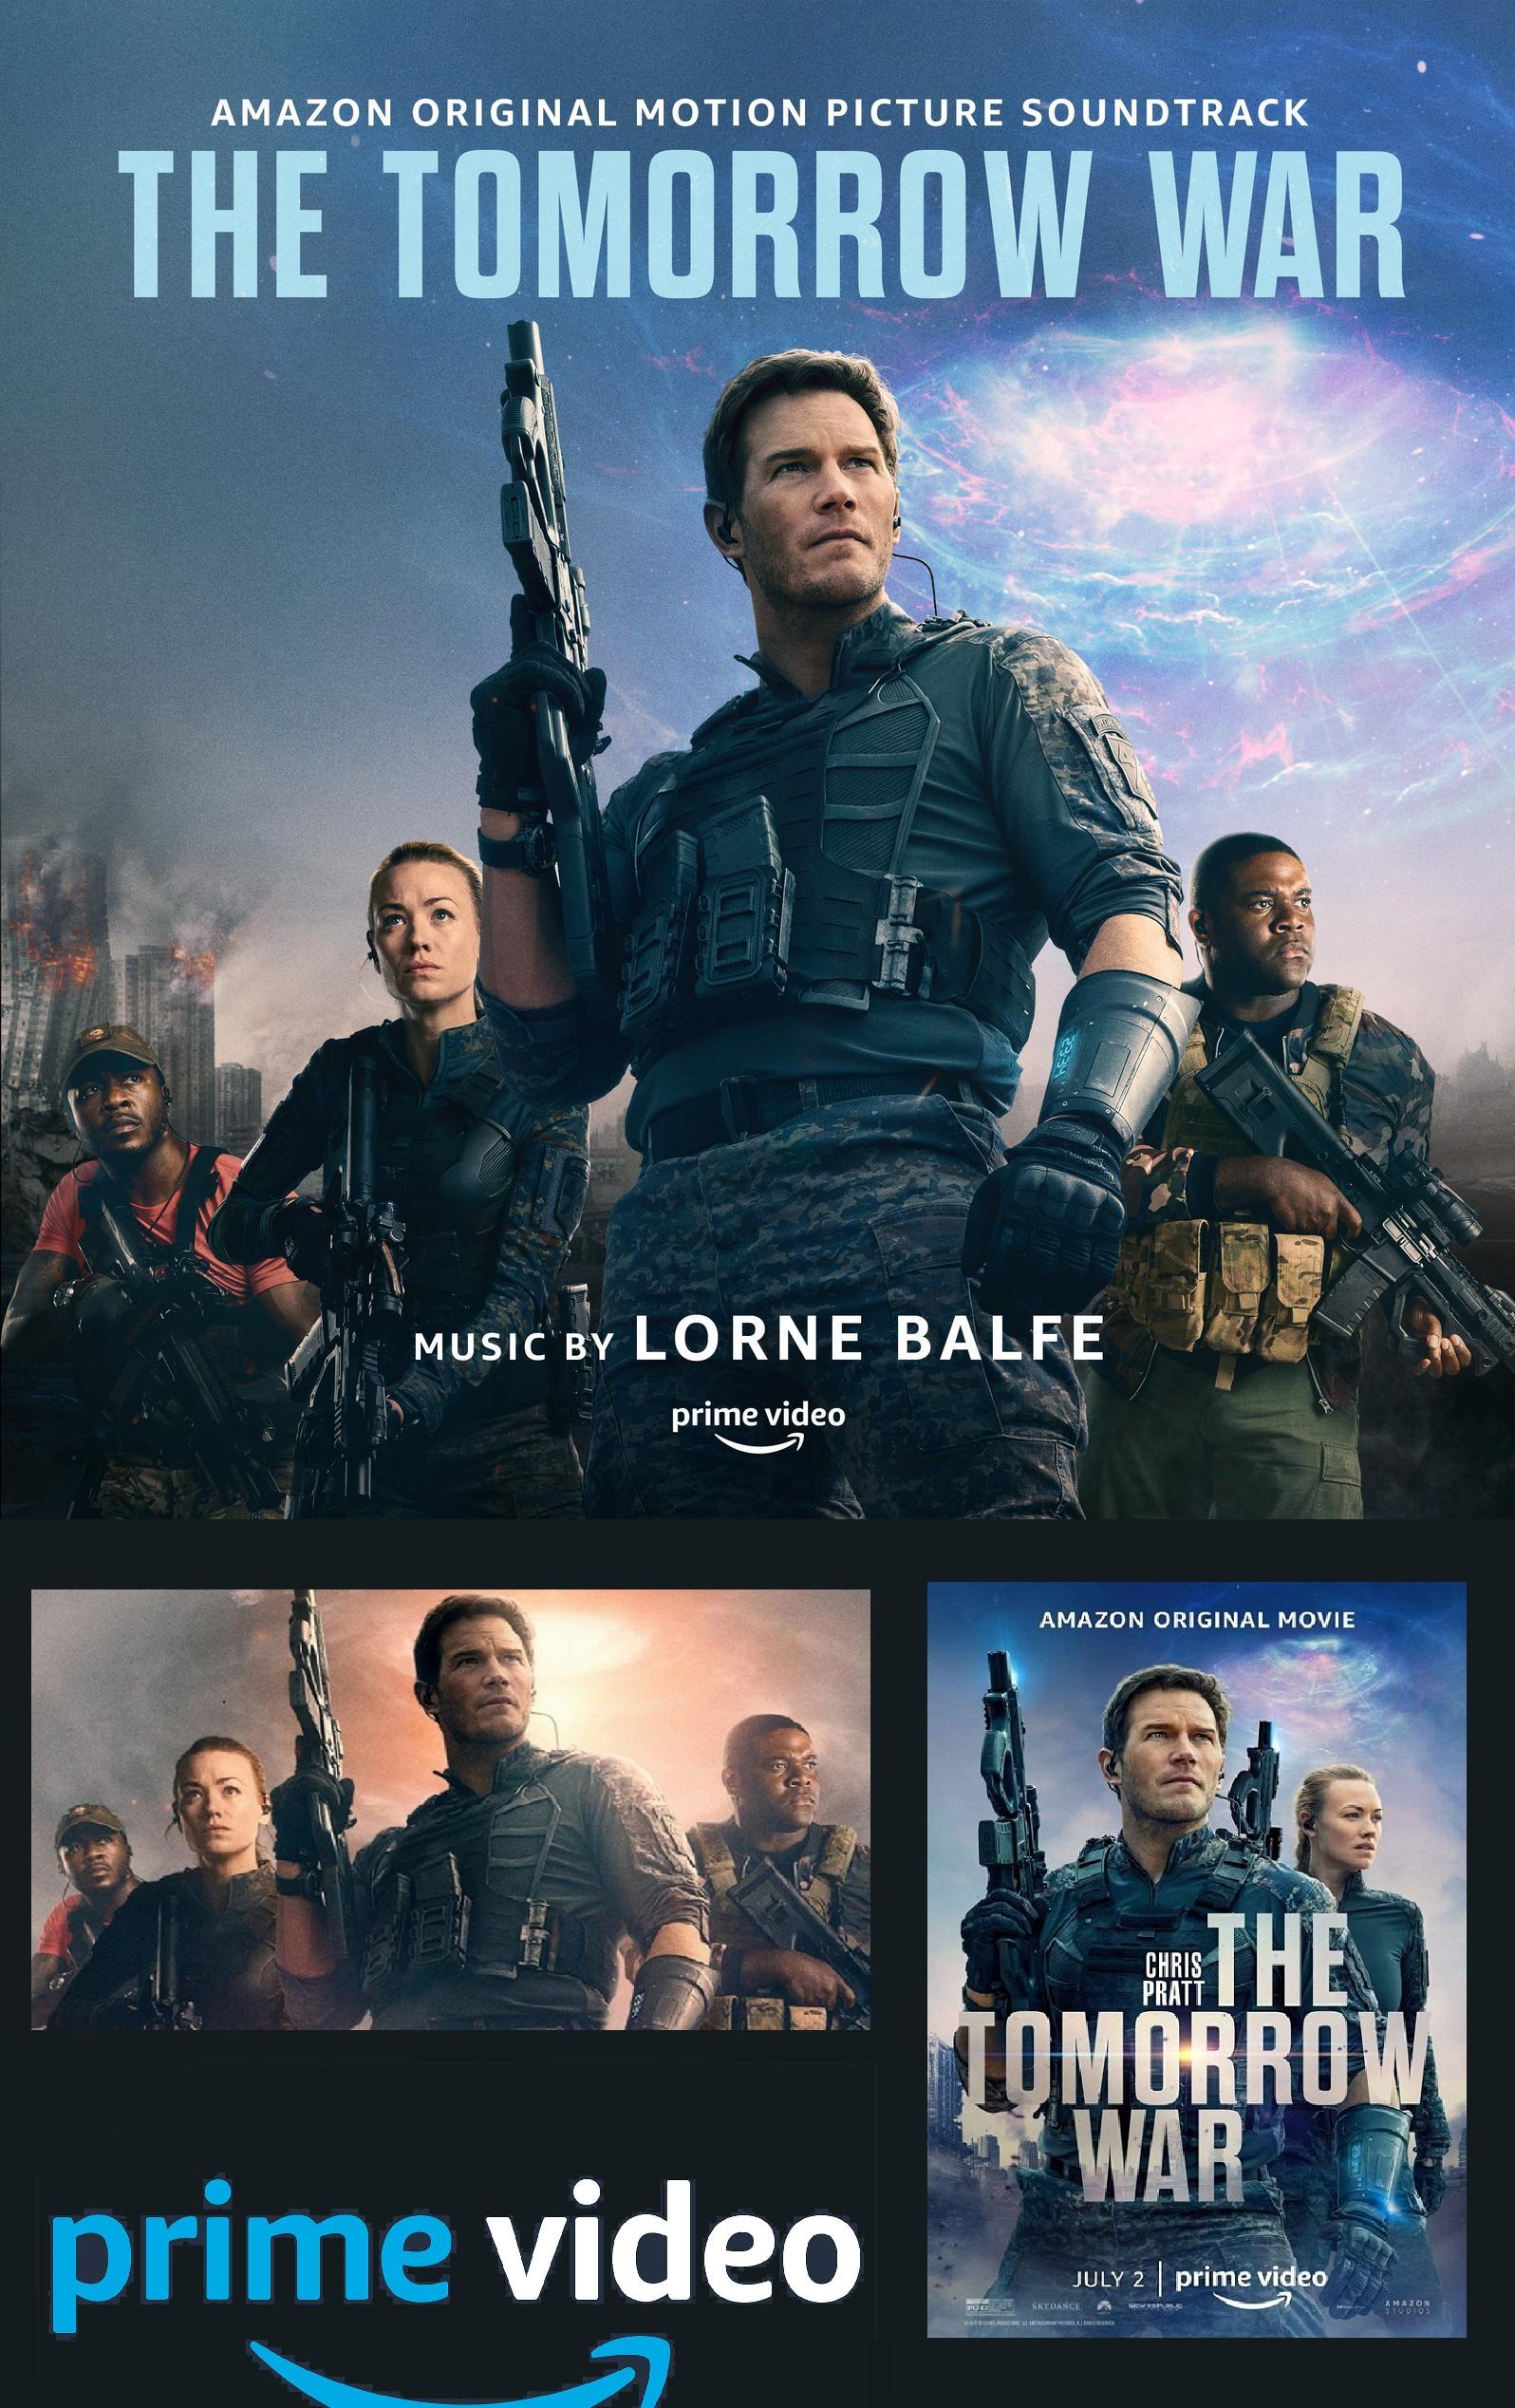 The Tomorrow War (Amazon)